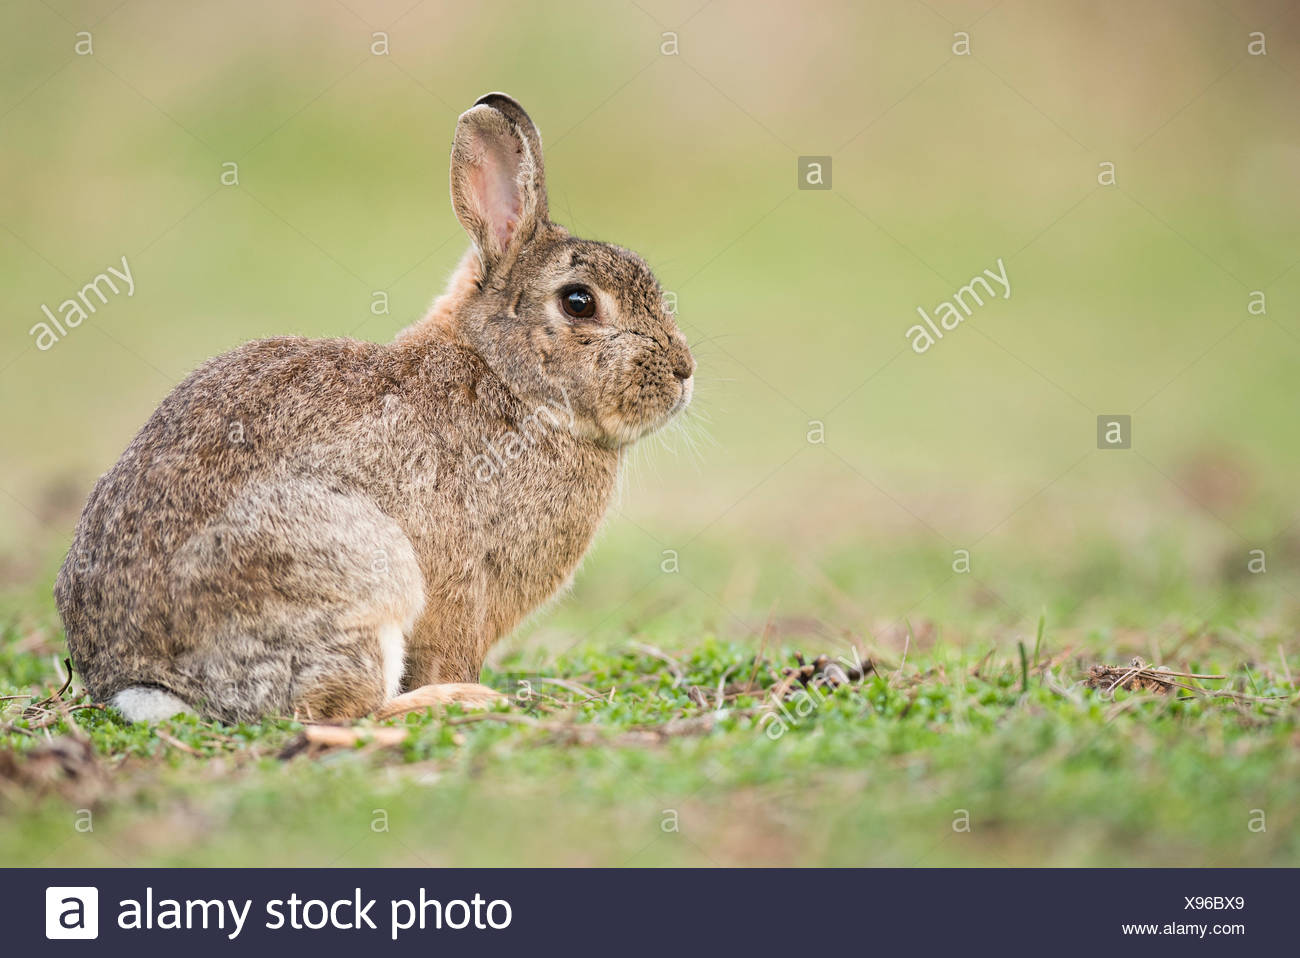 European rabbit (Oryctolagus cuniculus), Lower Austria, Austria - Stock Image